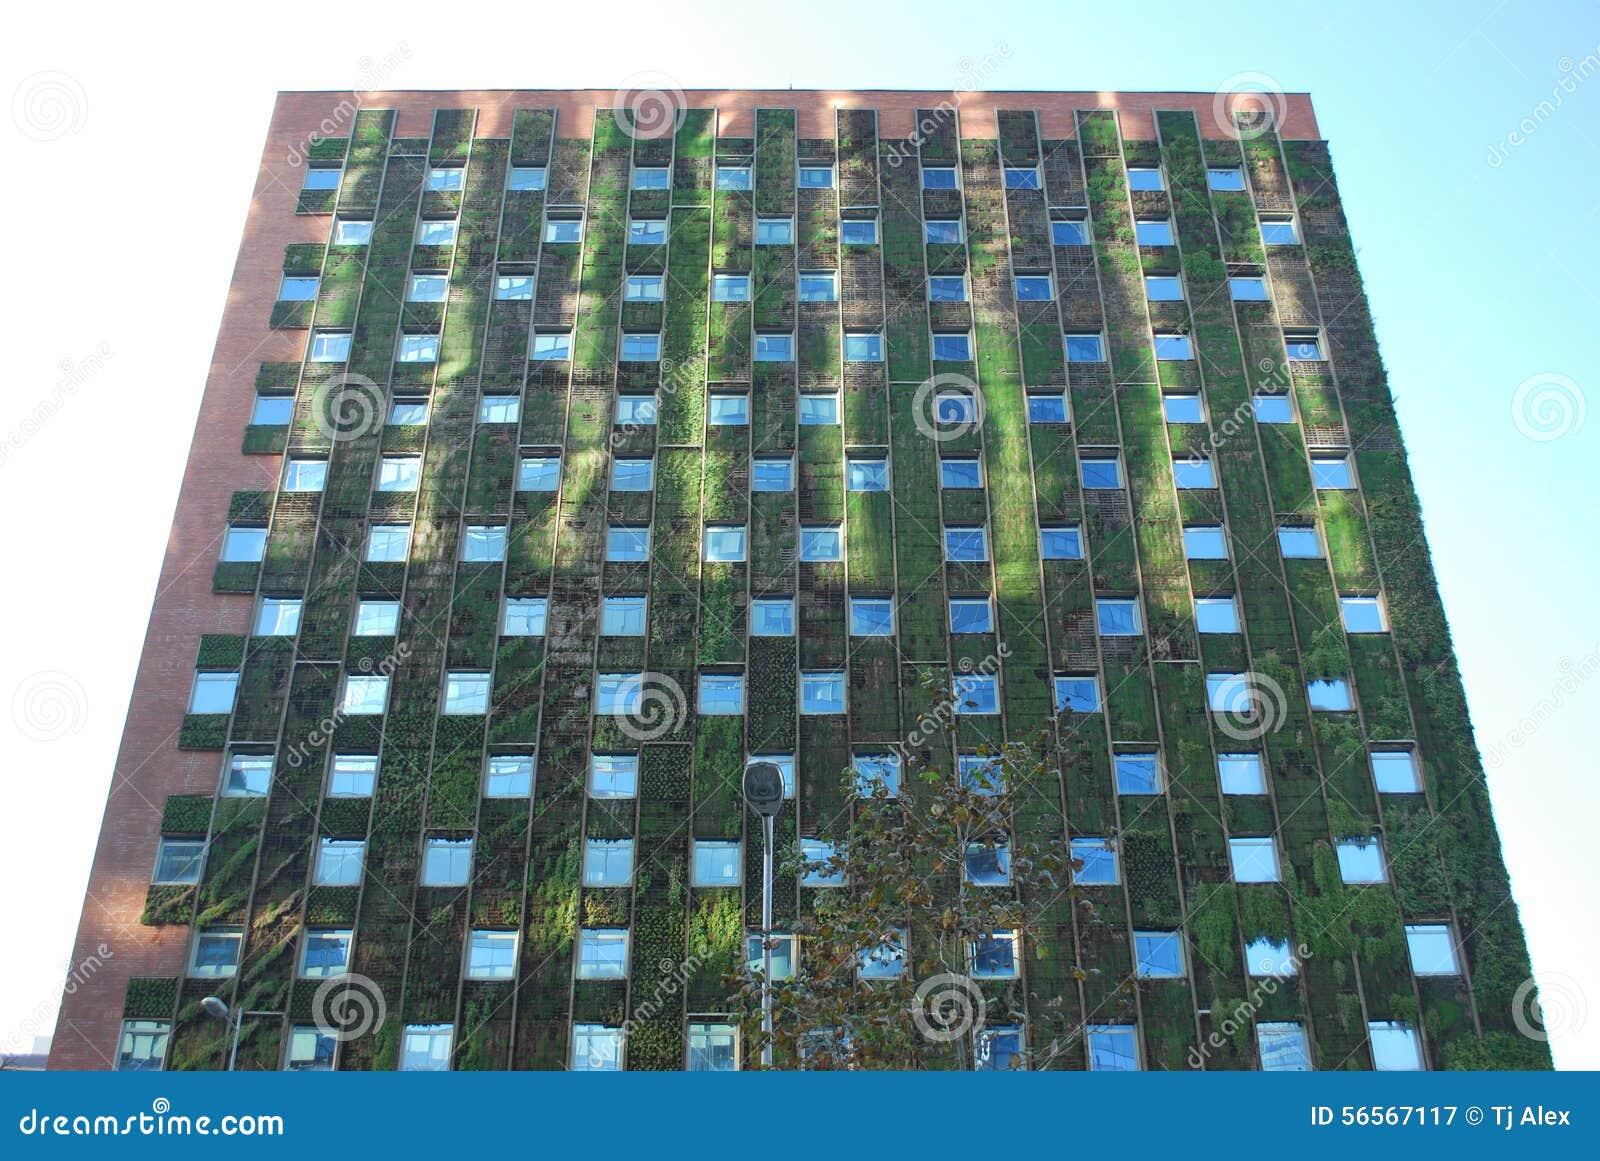 Download Καταπληκτικοί ουρανοξύστες στο Σαντιάγο, Χιλή Στοκ Εικόνα - εικόνα από ξενοδοχεία, ουρανοξύστες: 56567117